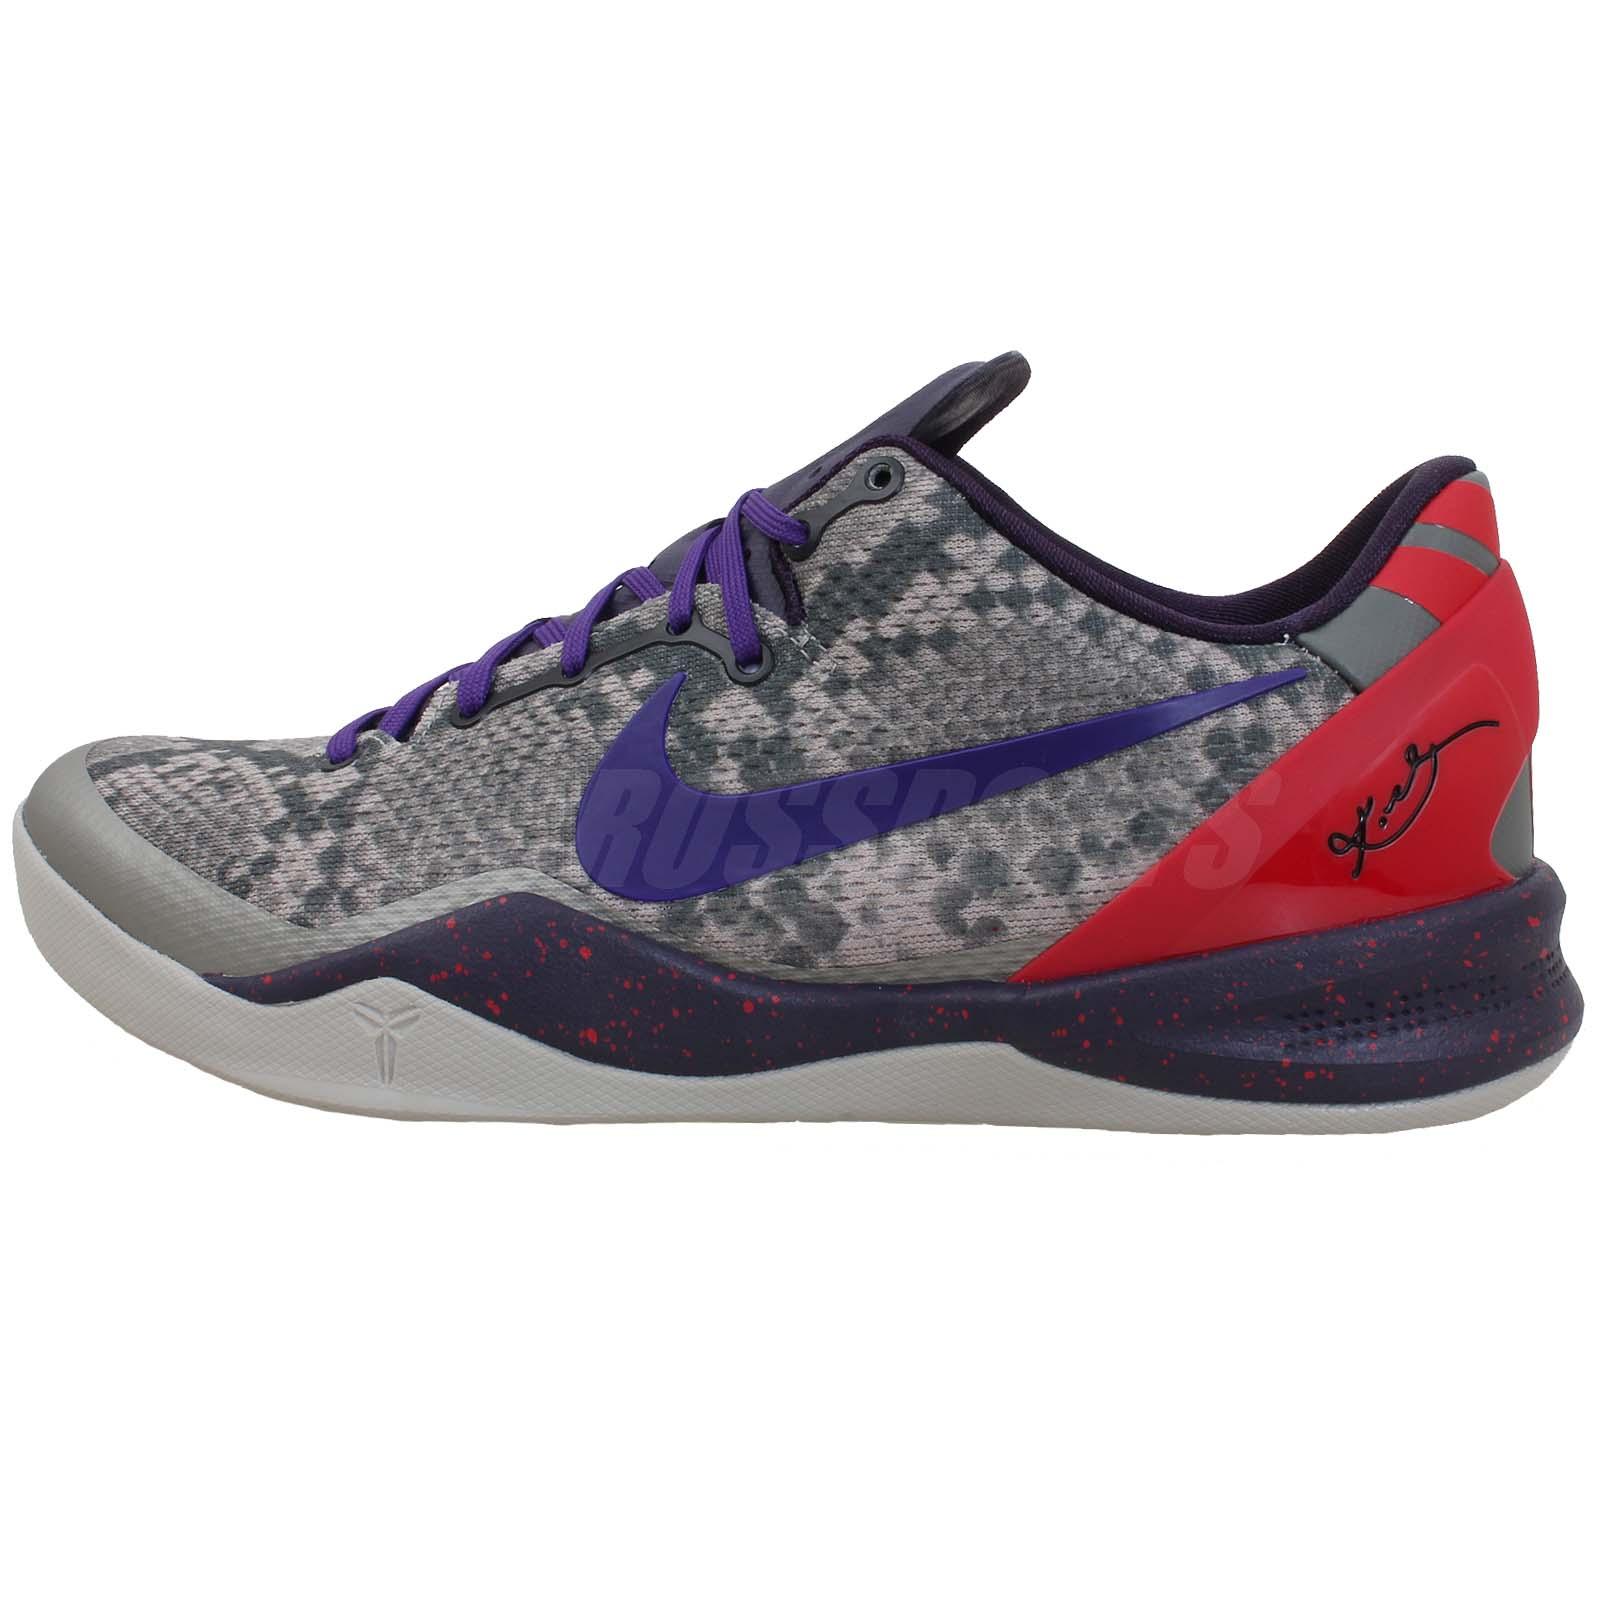 Nike Kobe 8 System VIII Bryant Grey Purple Black Mamba ...